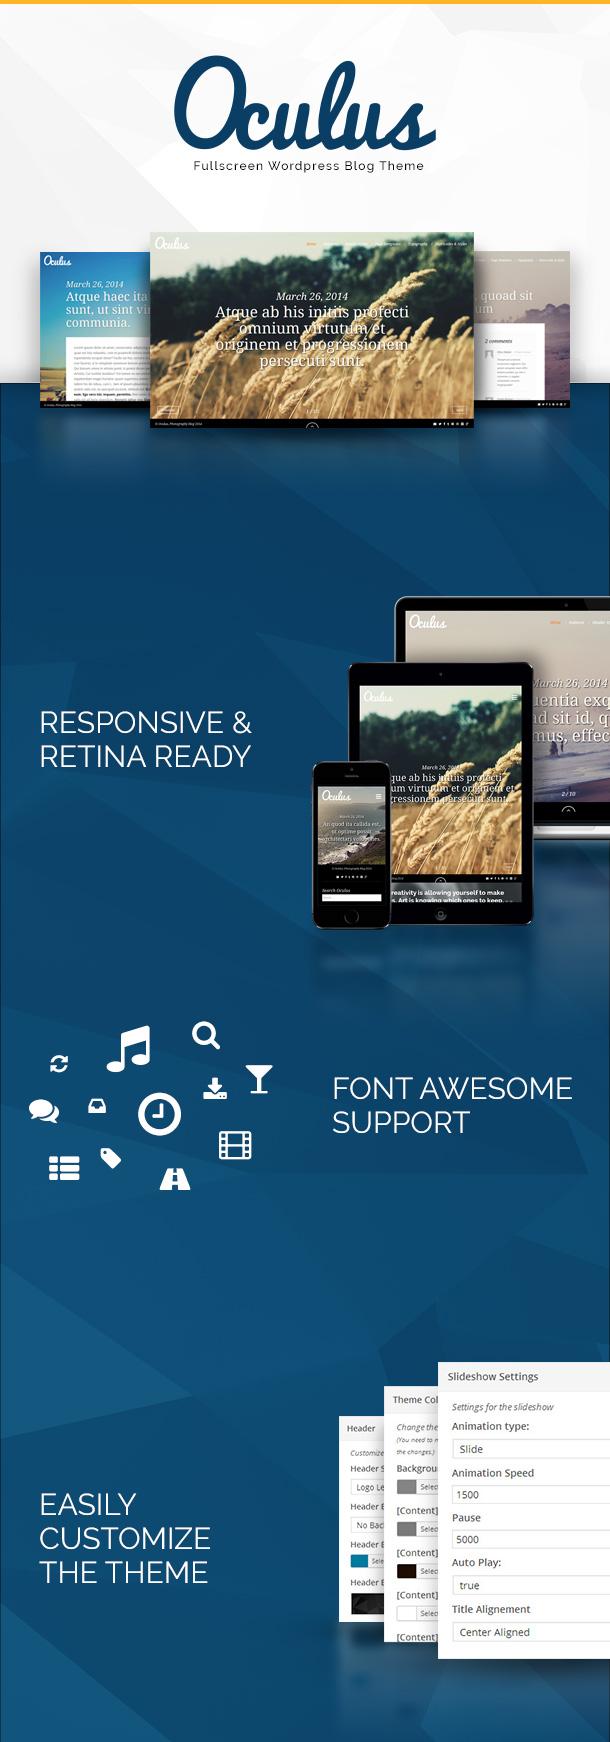 Oculus - Fullscreen Responsive WordPress Blog